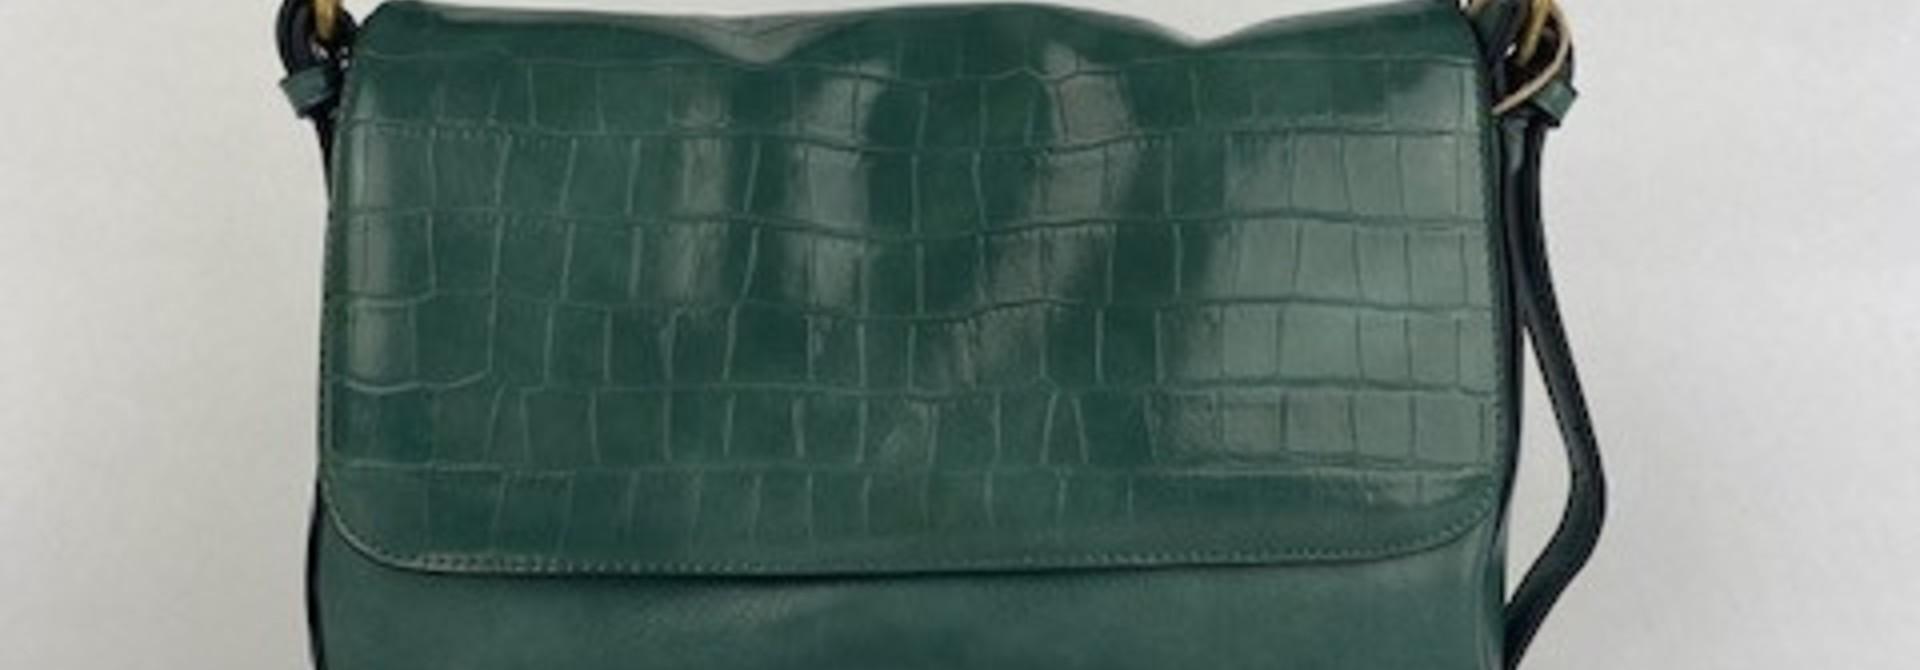 Hatice croco bag Ash Green